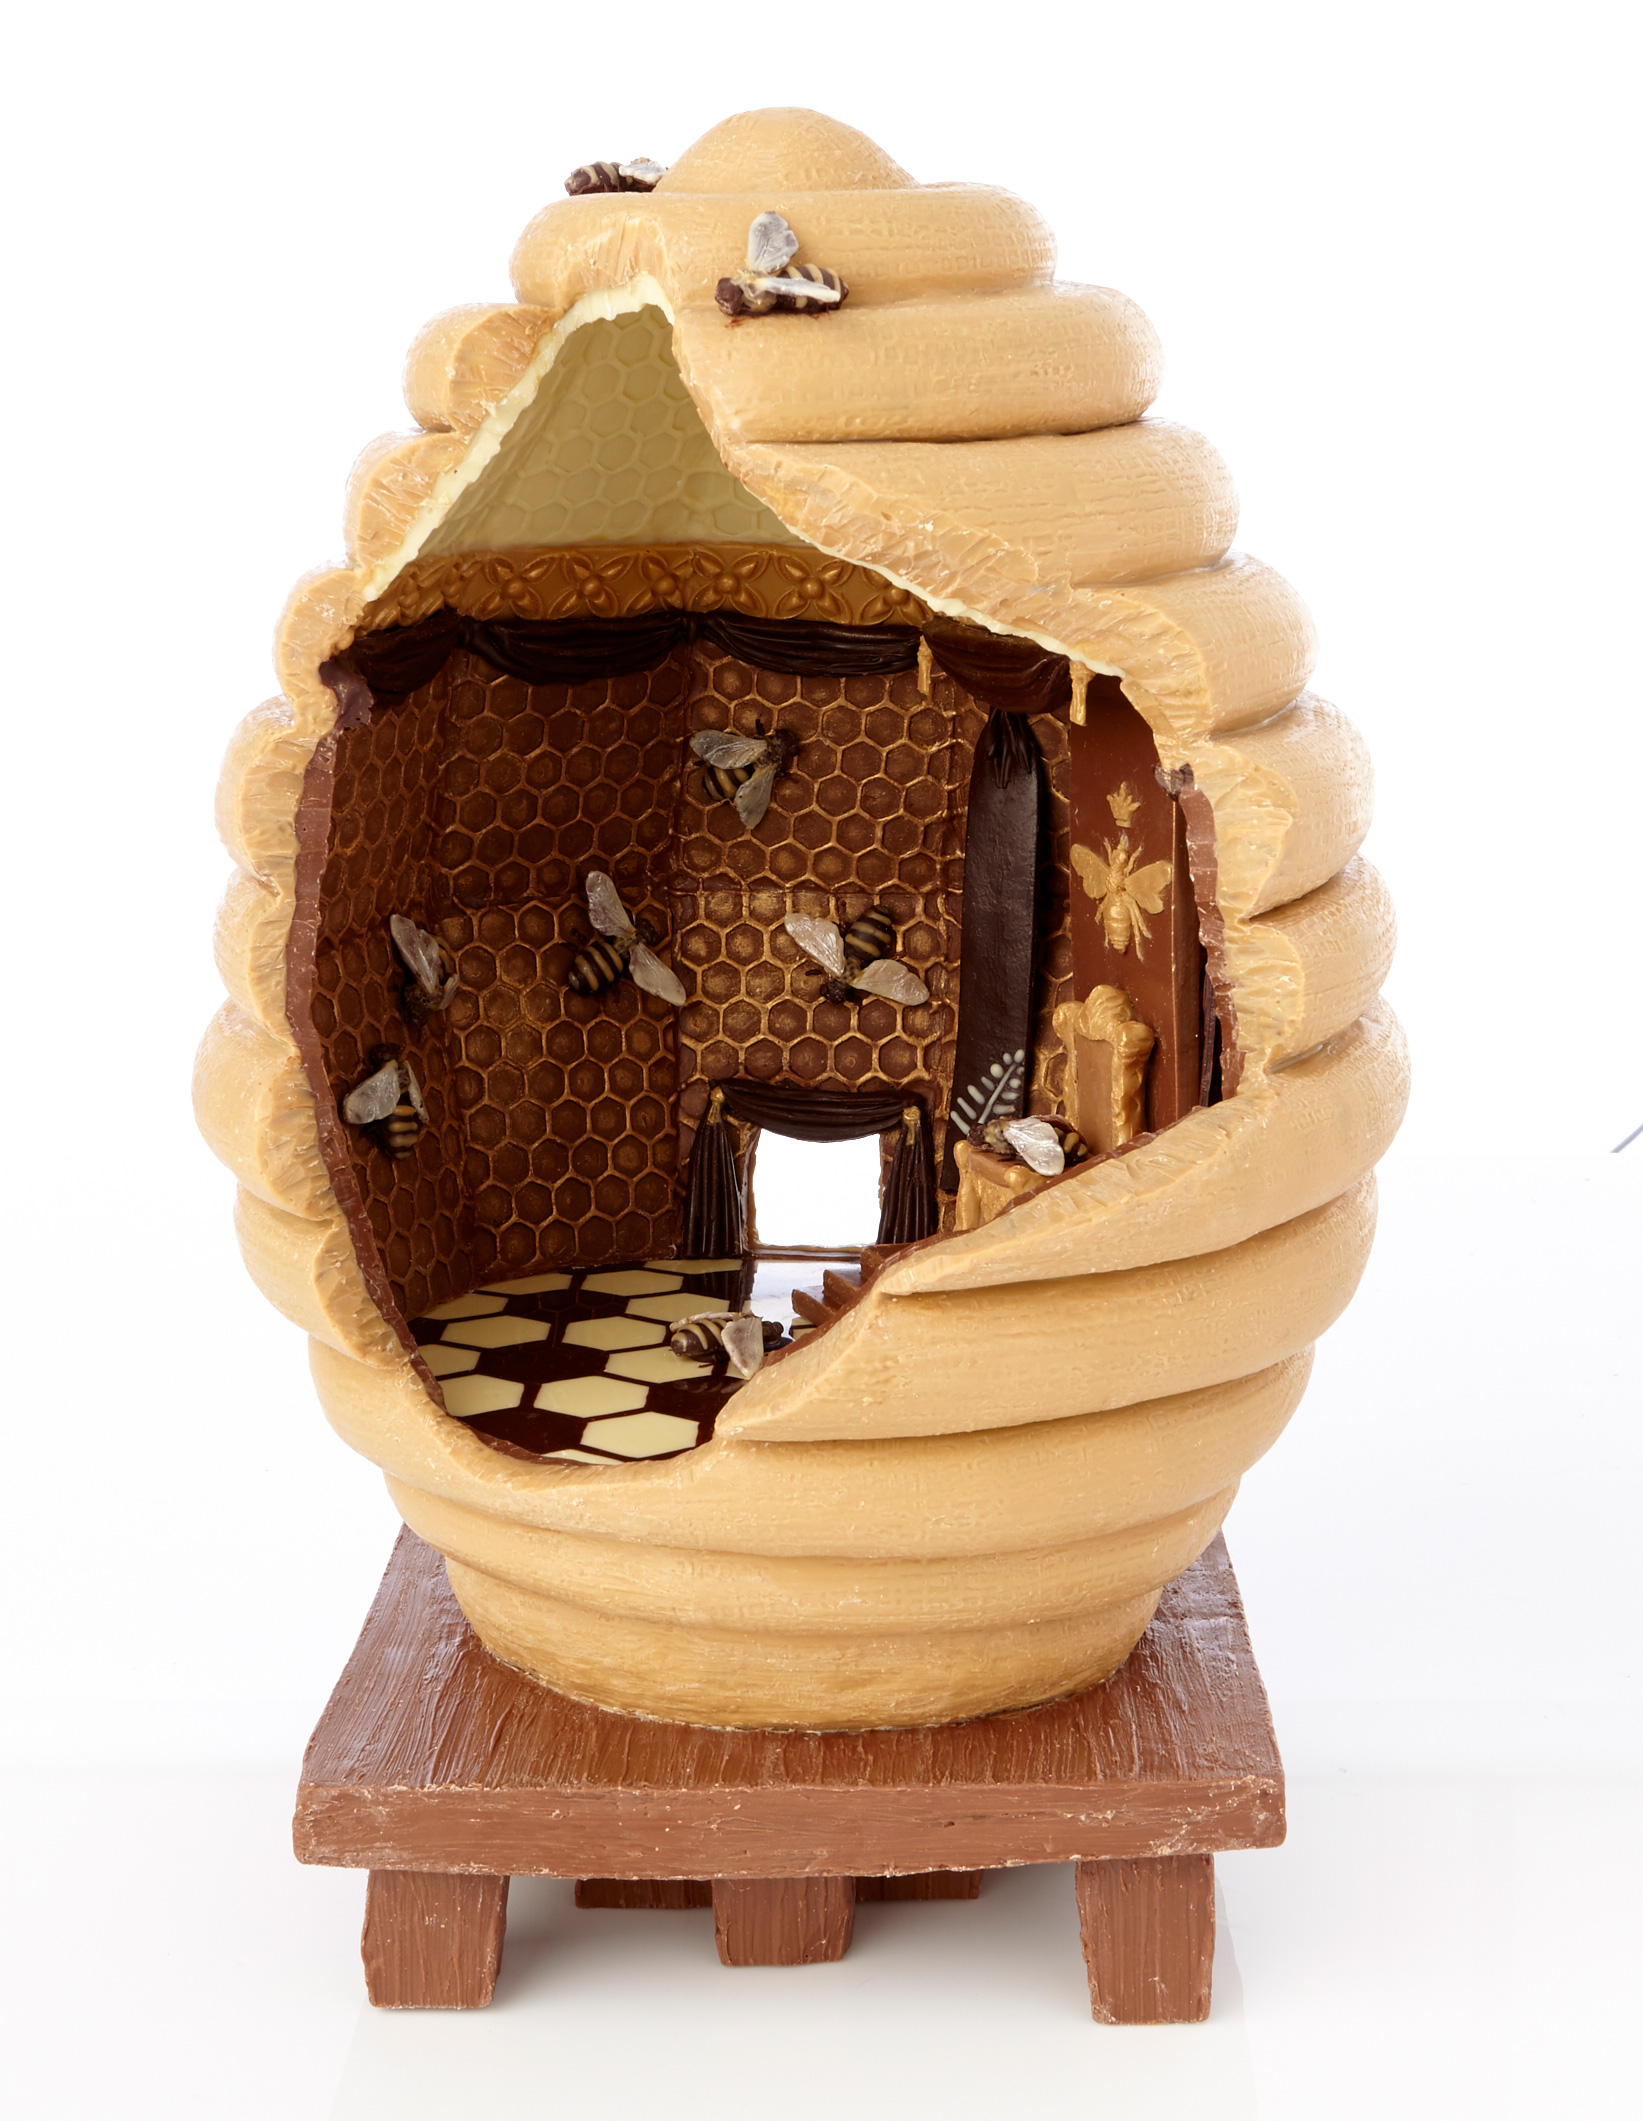 Chocolate Beehive Sculpture